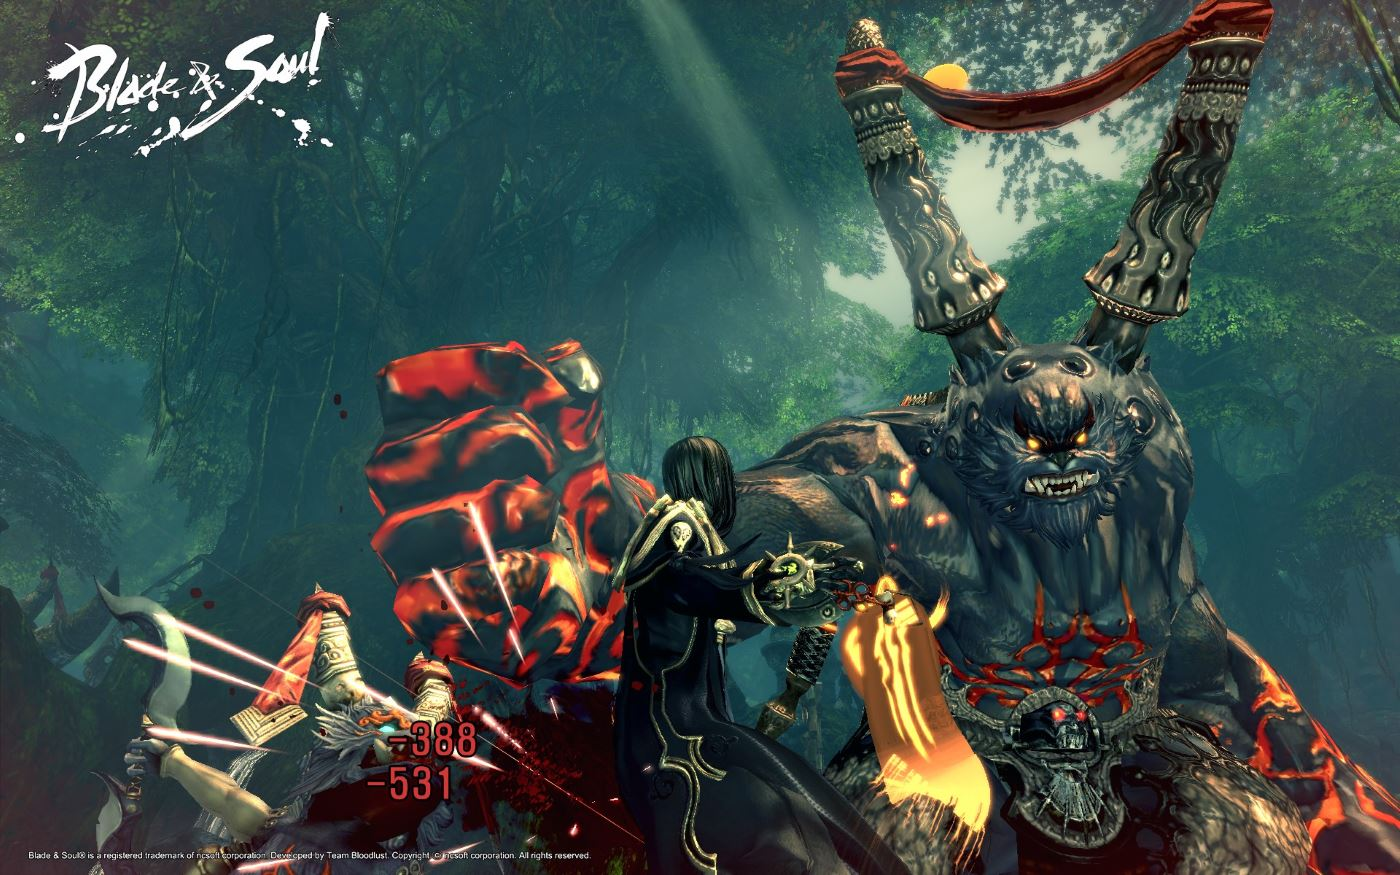 Blade & Soul Release im Westen – Kommt bald die Ankündigung?